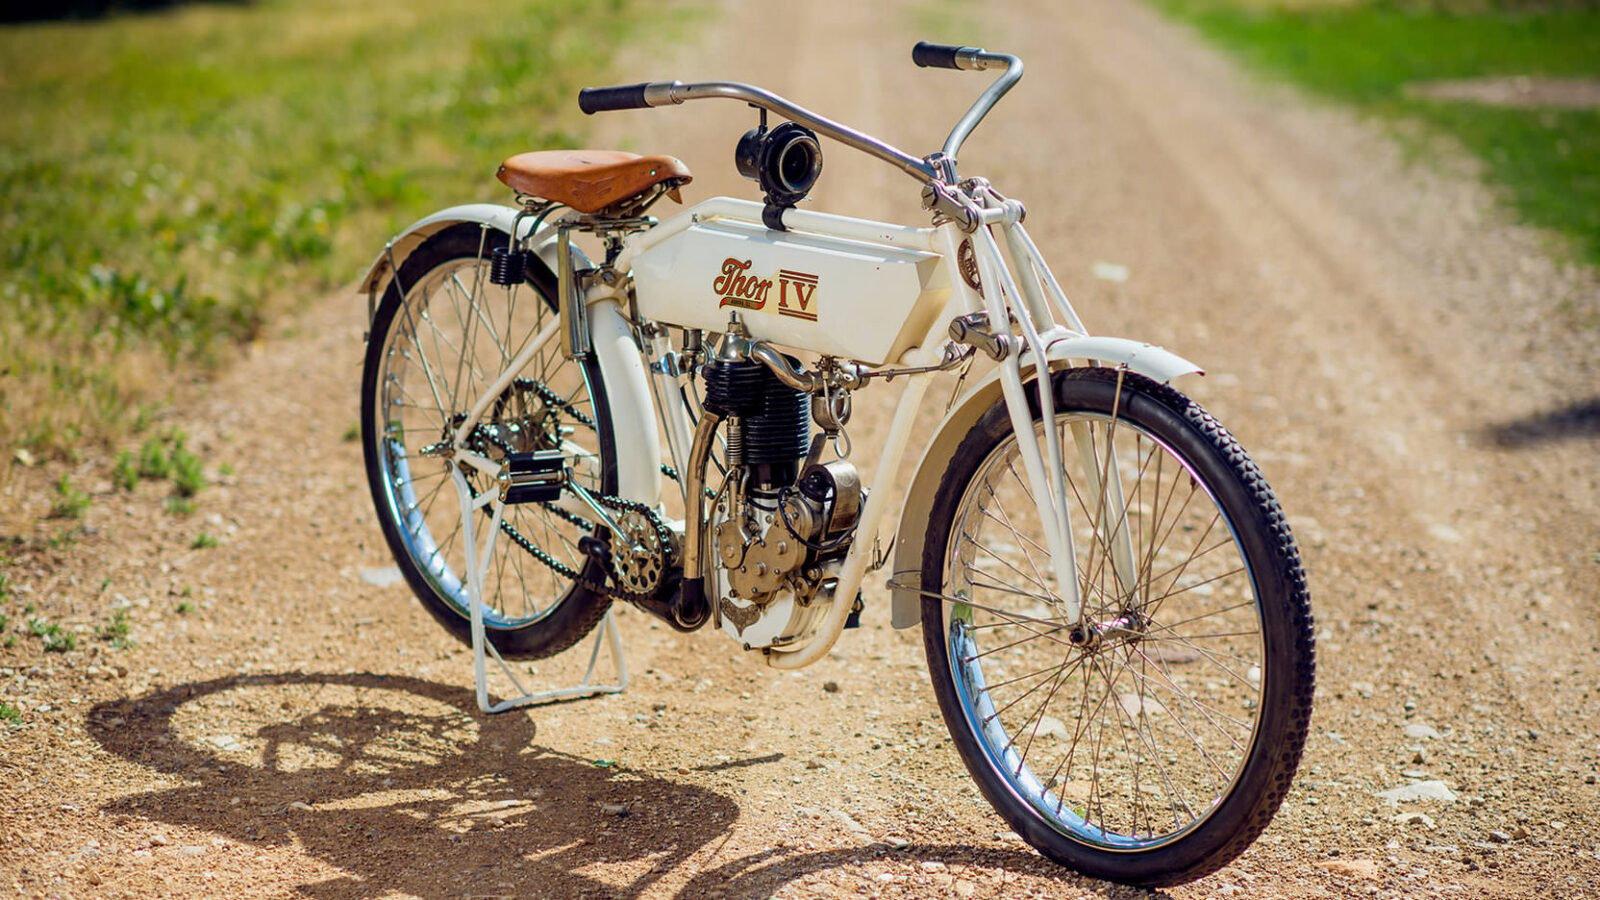 Thor Single Motorcycle 1600x900